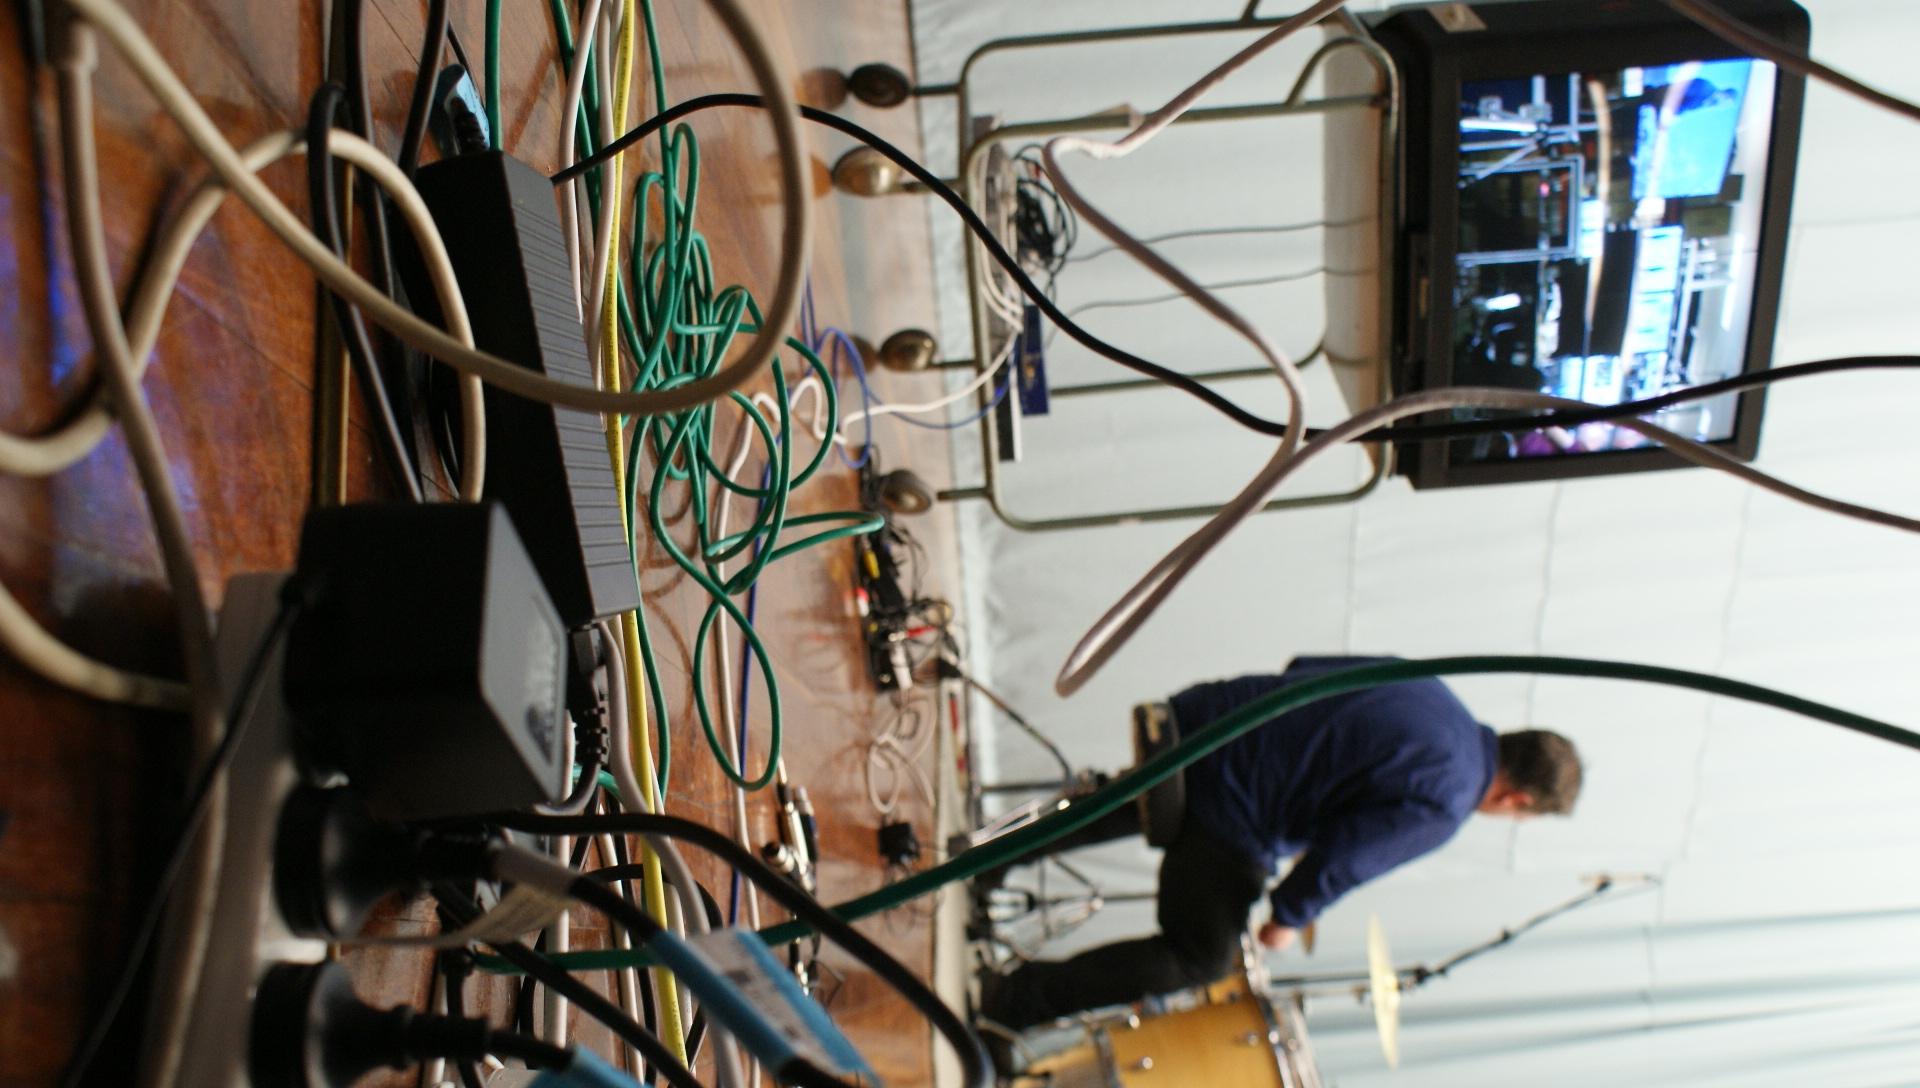 Syna_1 Setup: Cables